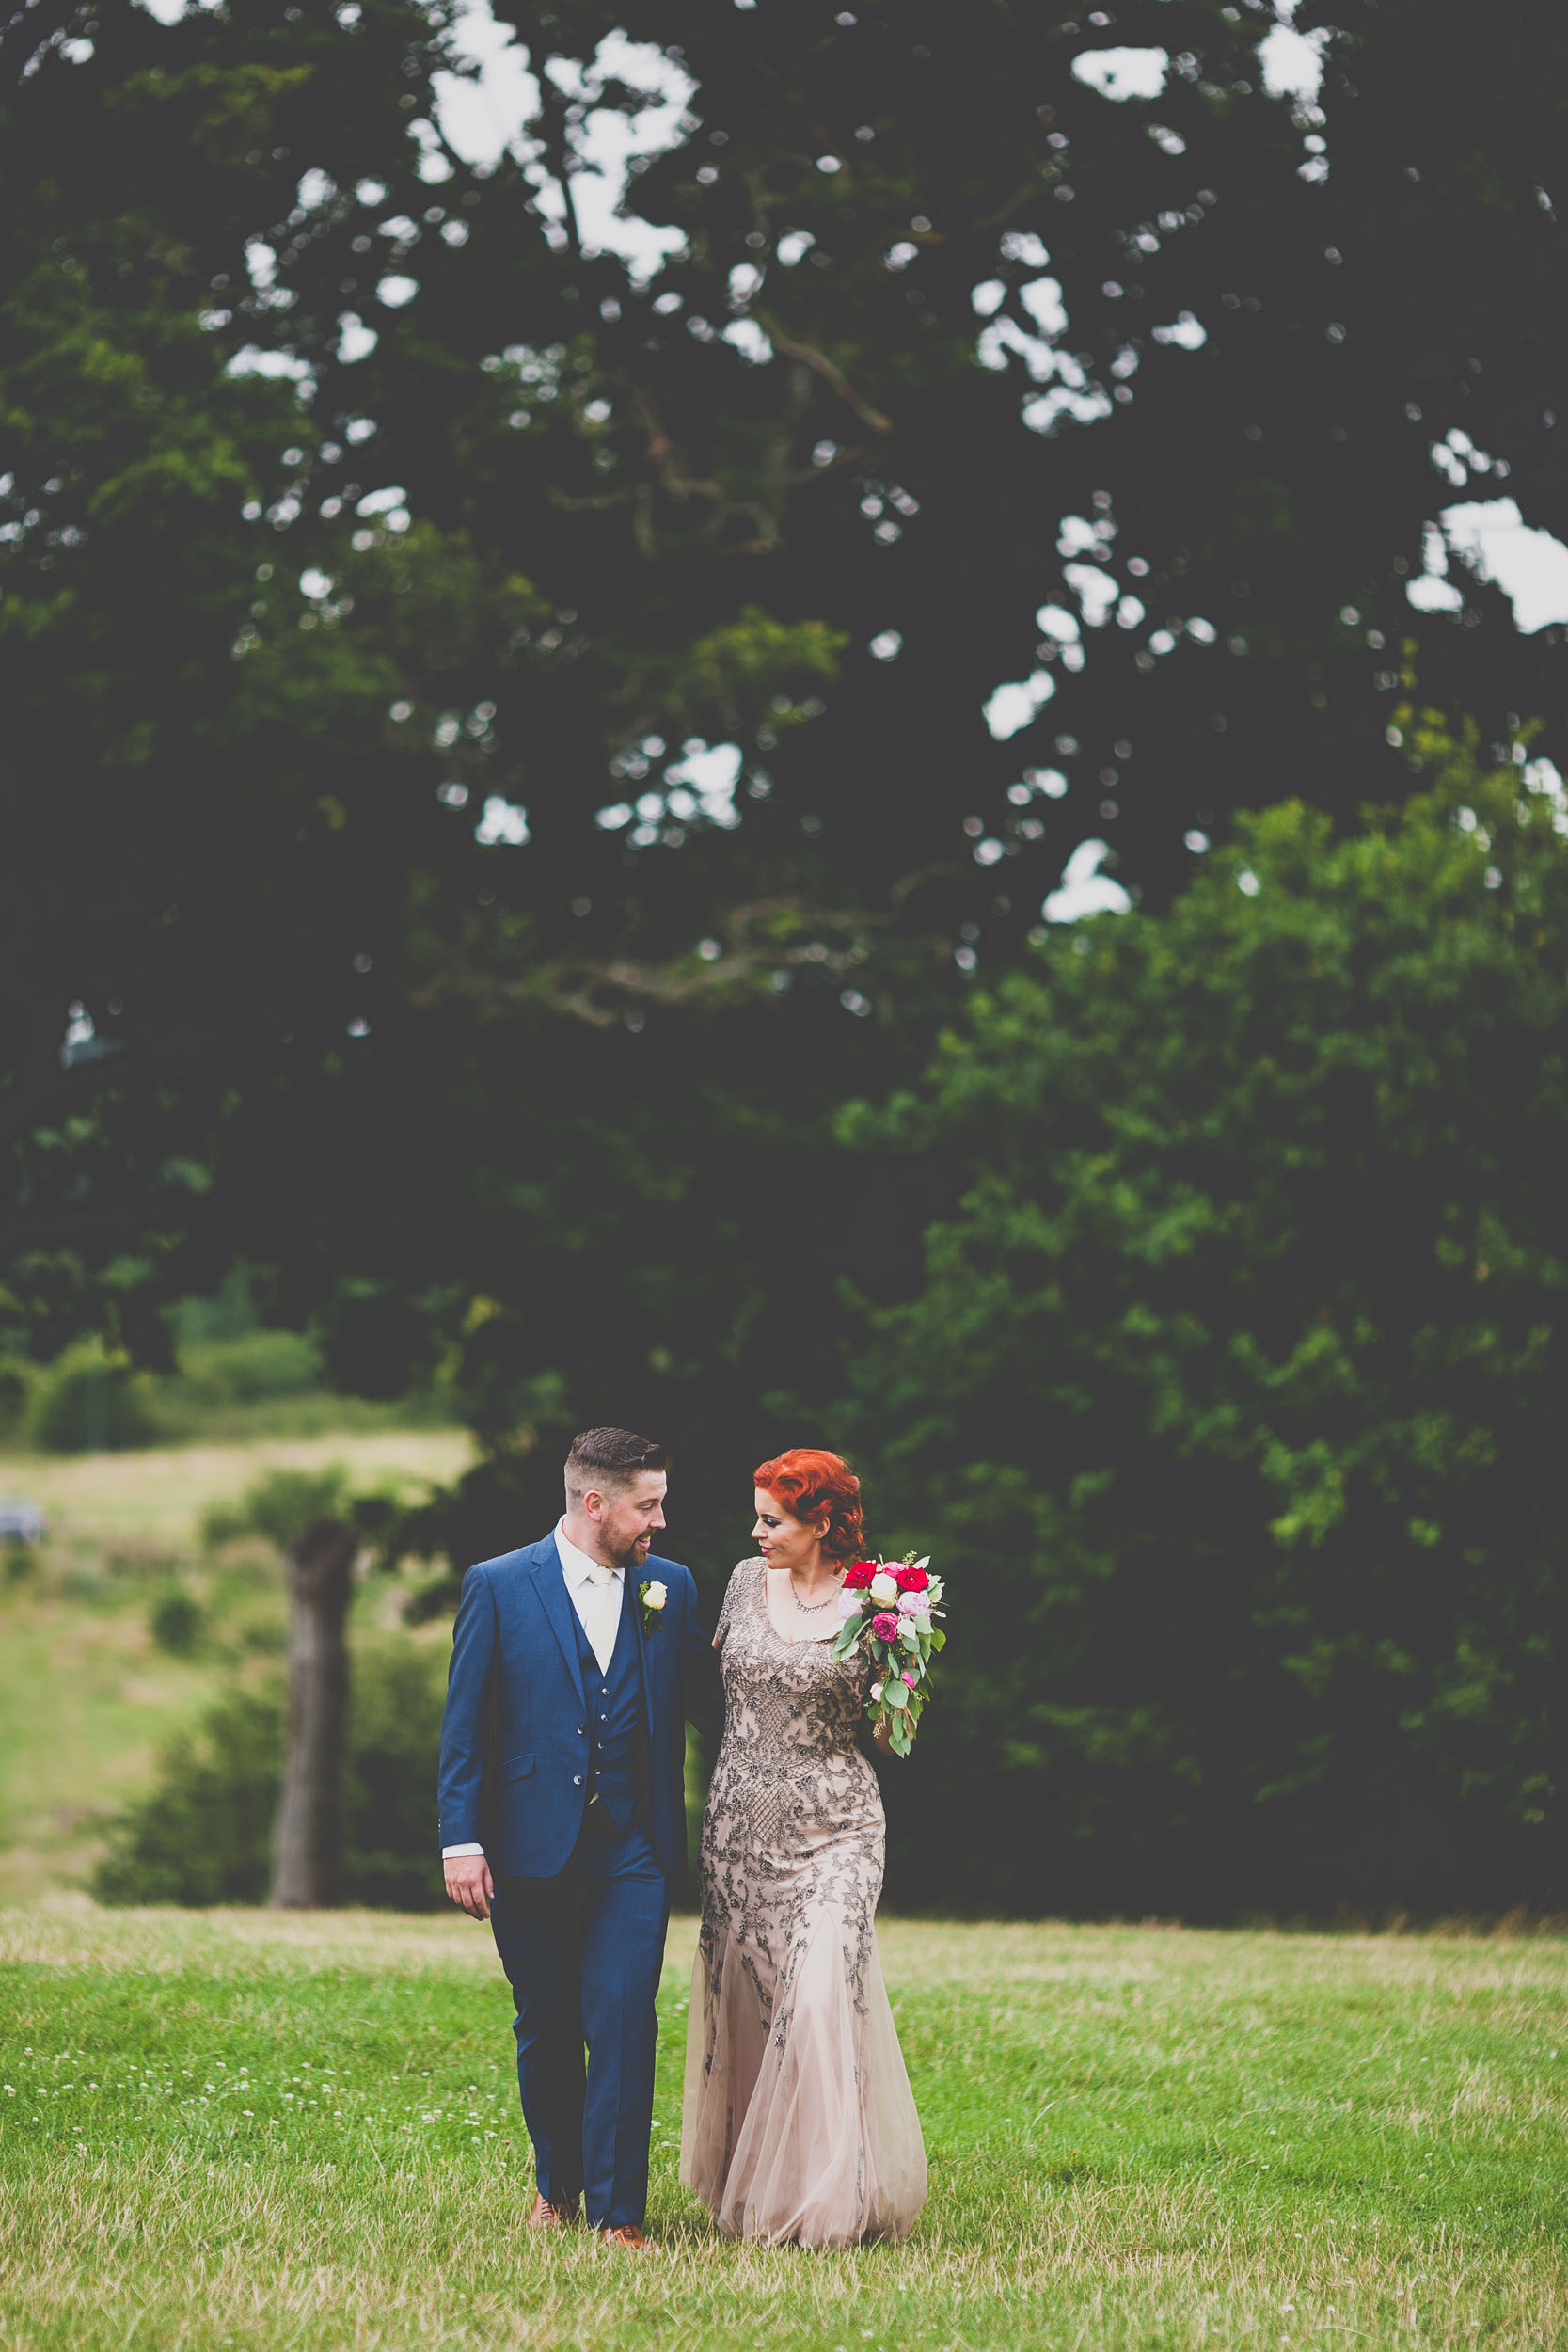 queen-elizabeths-hunting-lodge-epping-forest-wedding200.jpg